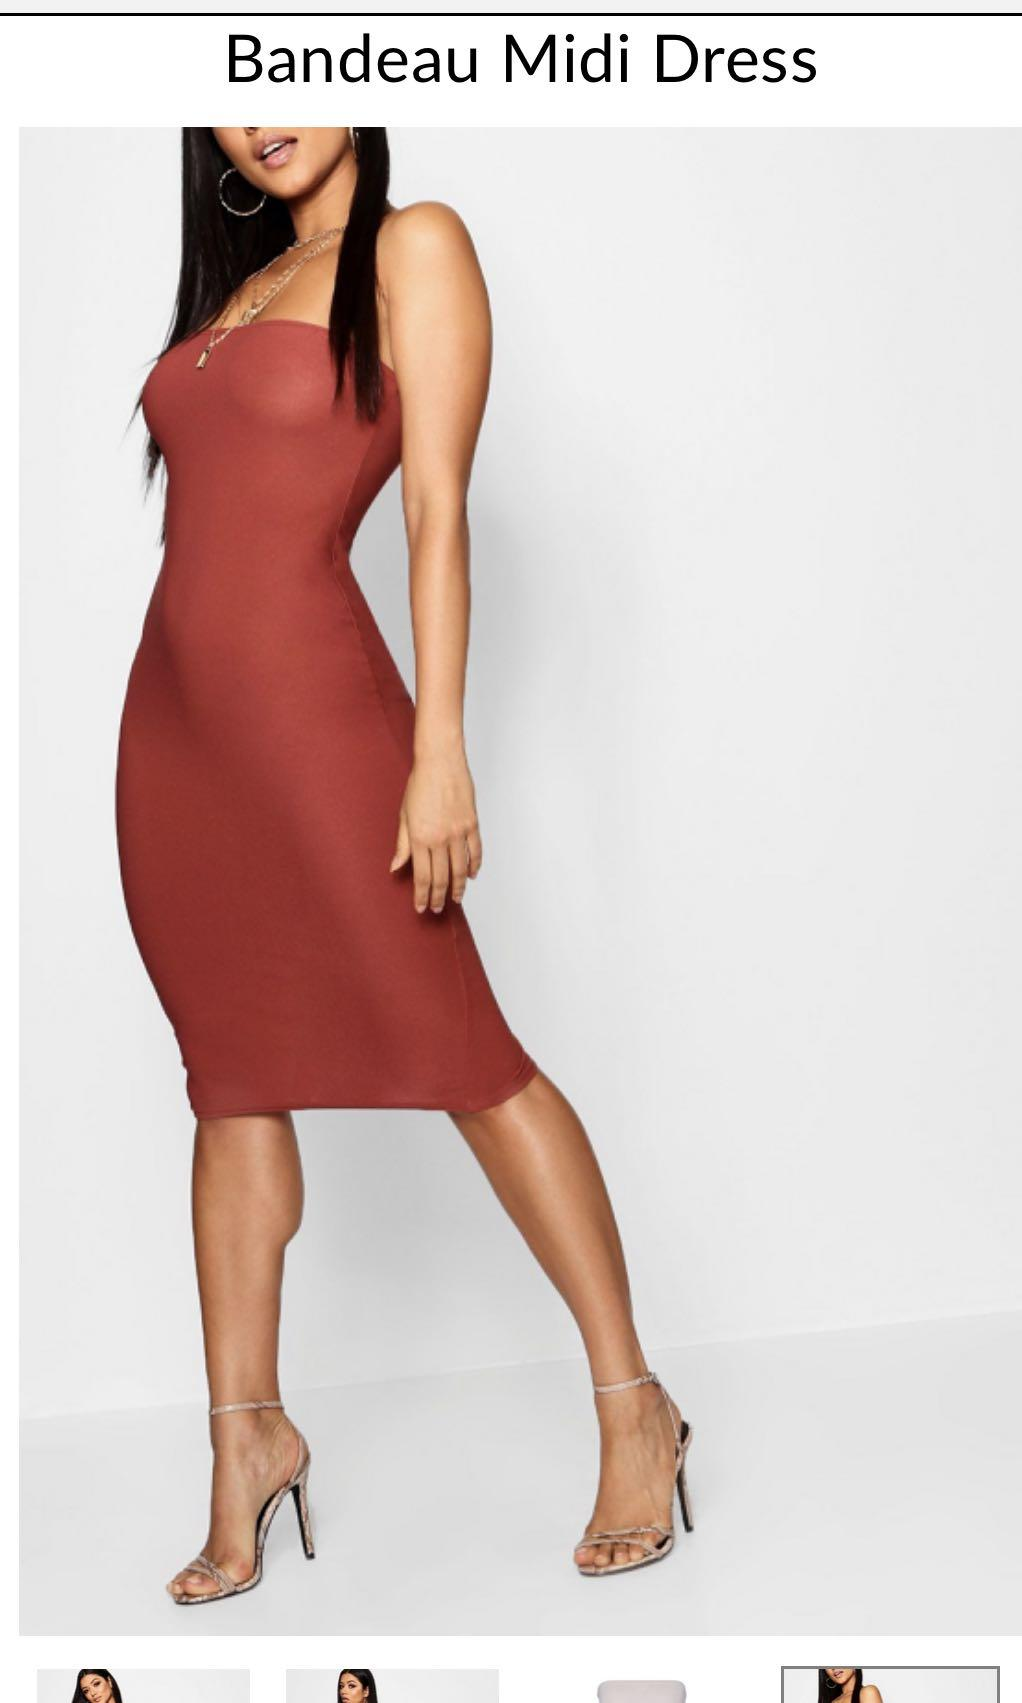 Bandeau mini dress